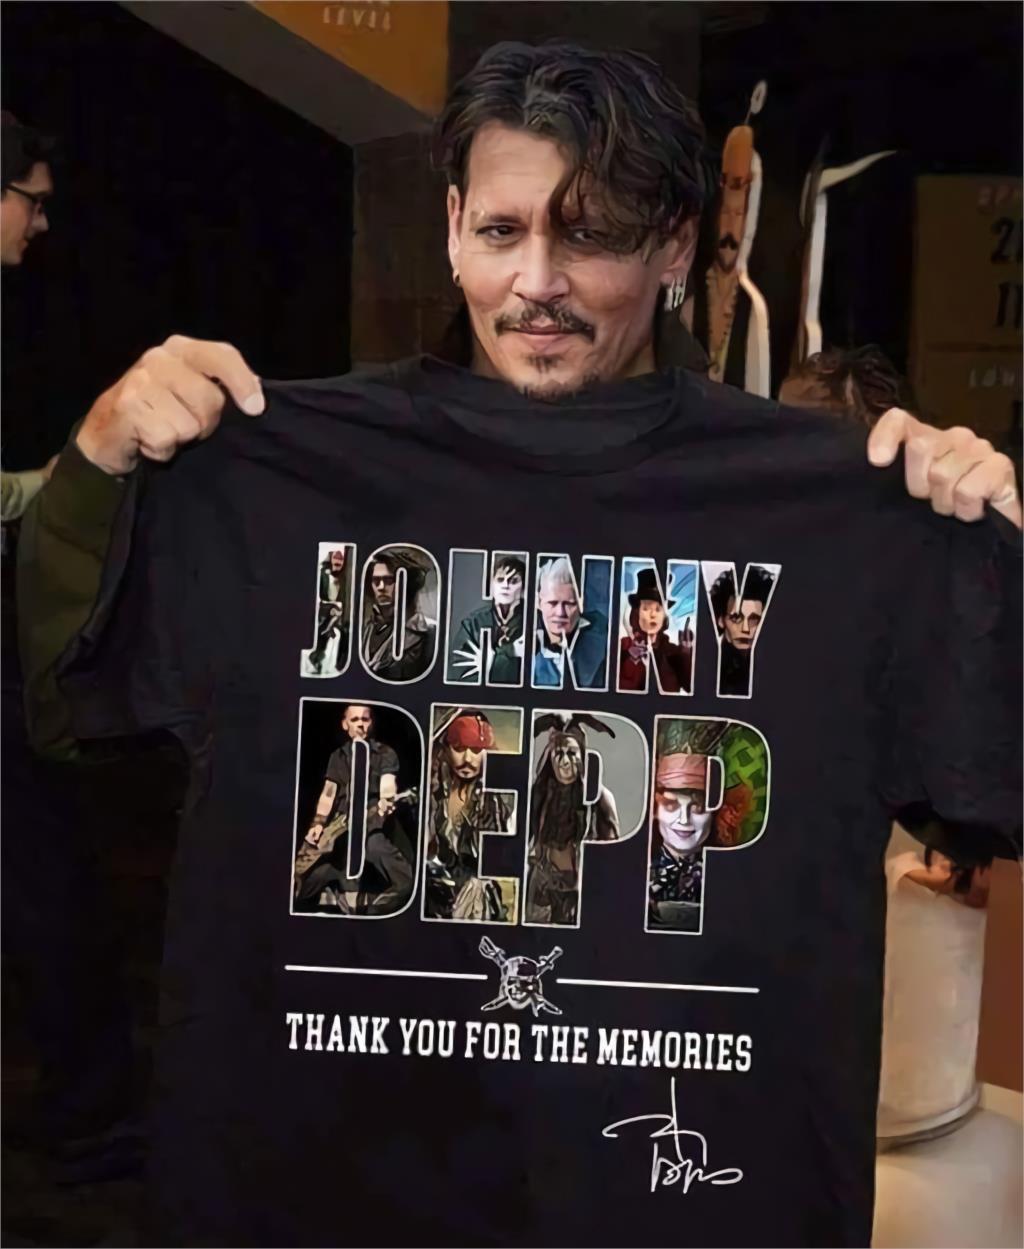 2020 Hot Fashion Boys T-shirt The  Johnny Depp Thank You For The Memorles 2020 Summer Men's Short Sleeve T-Shirt